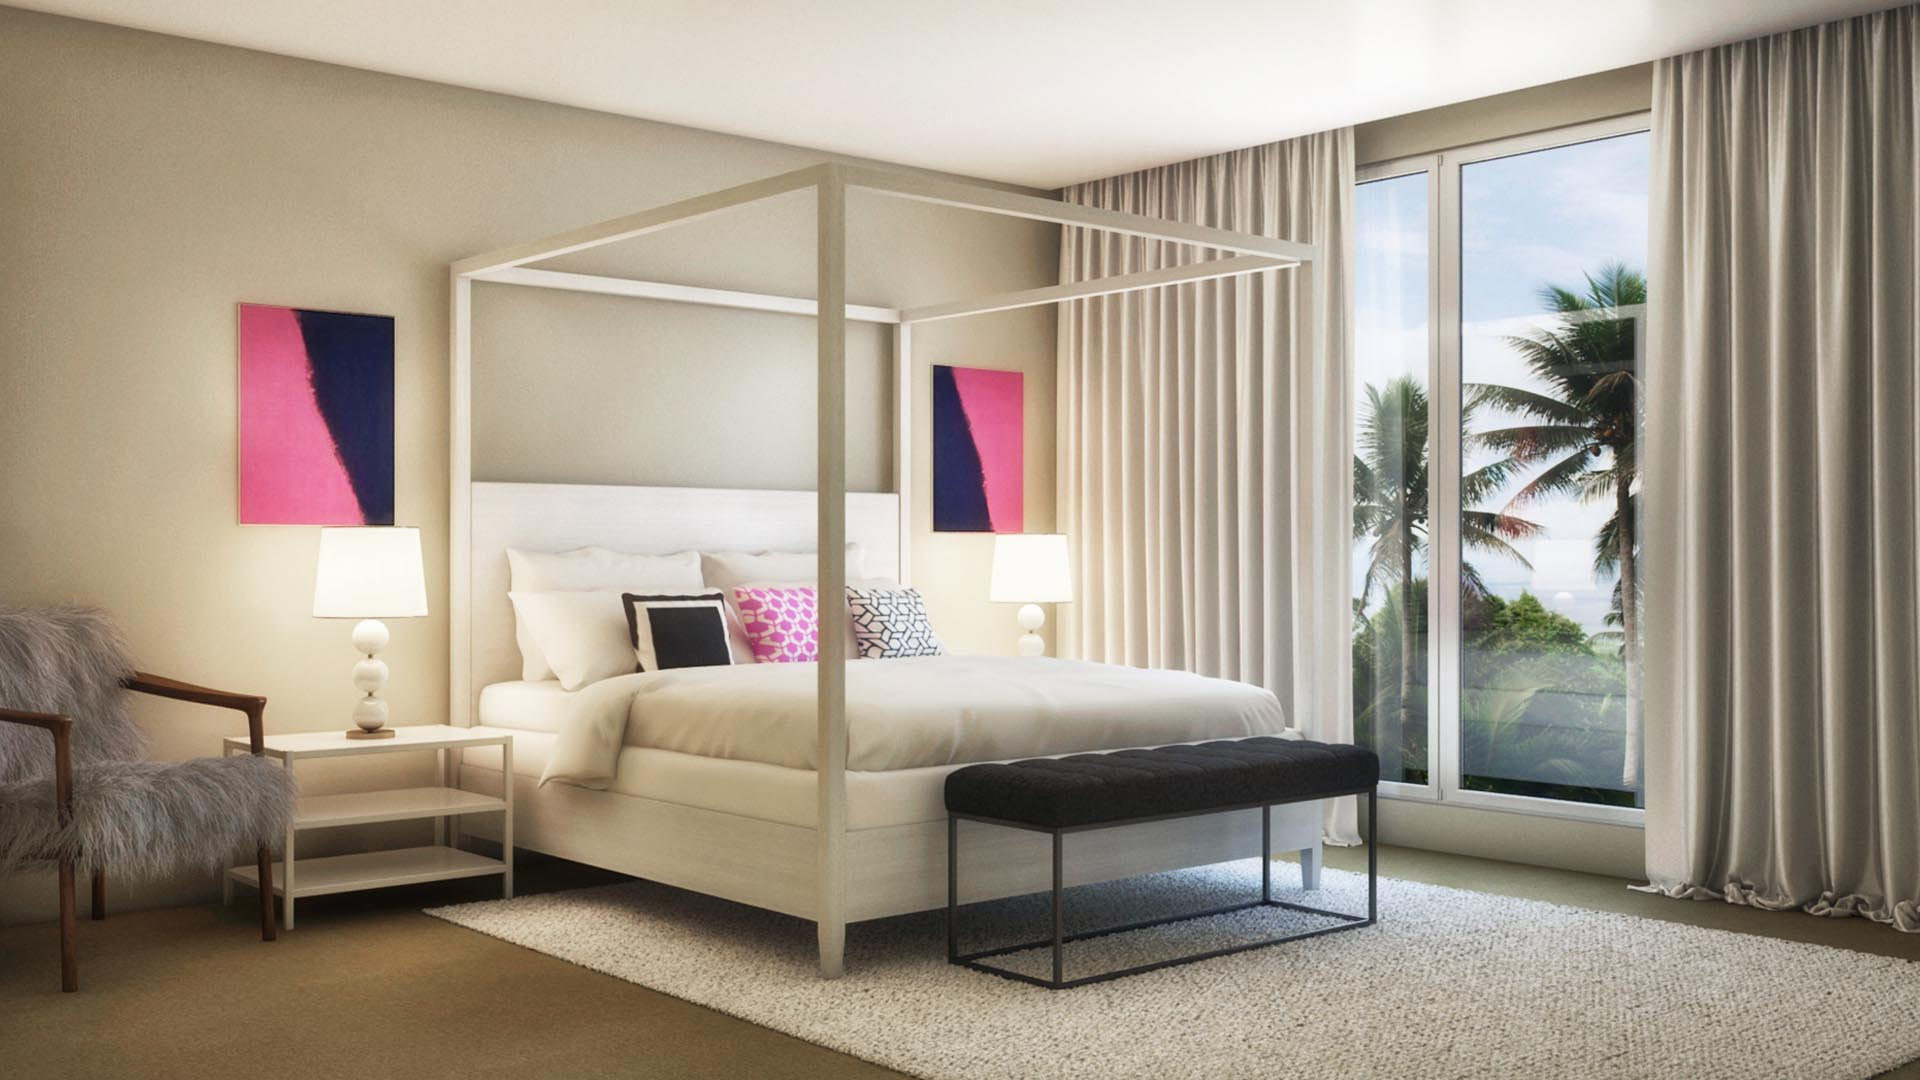 3D Render Interior Master Bedroom